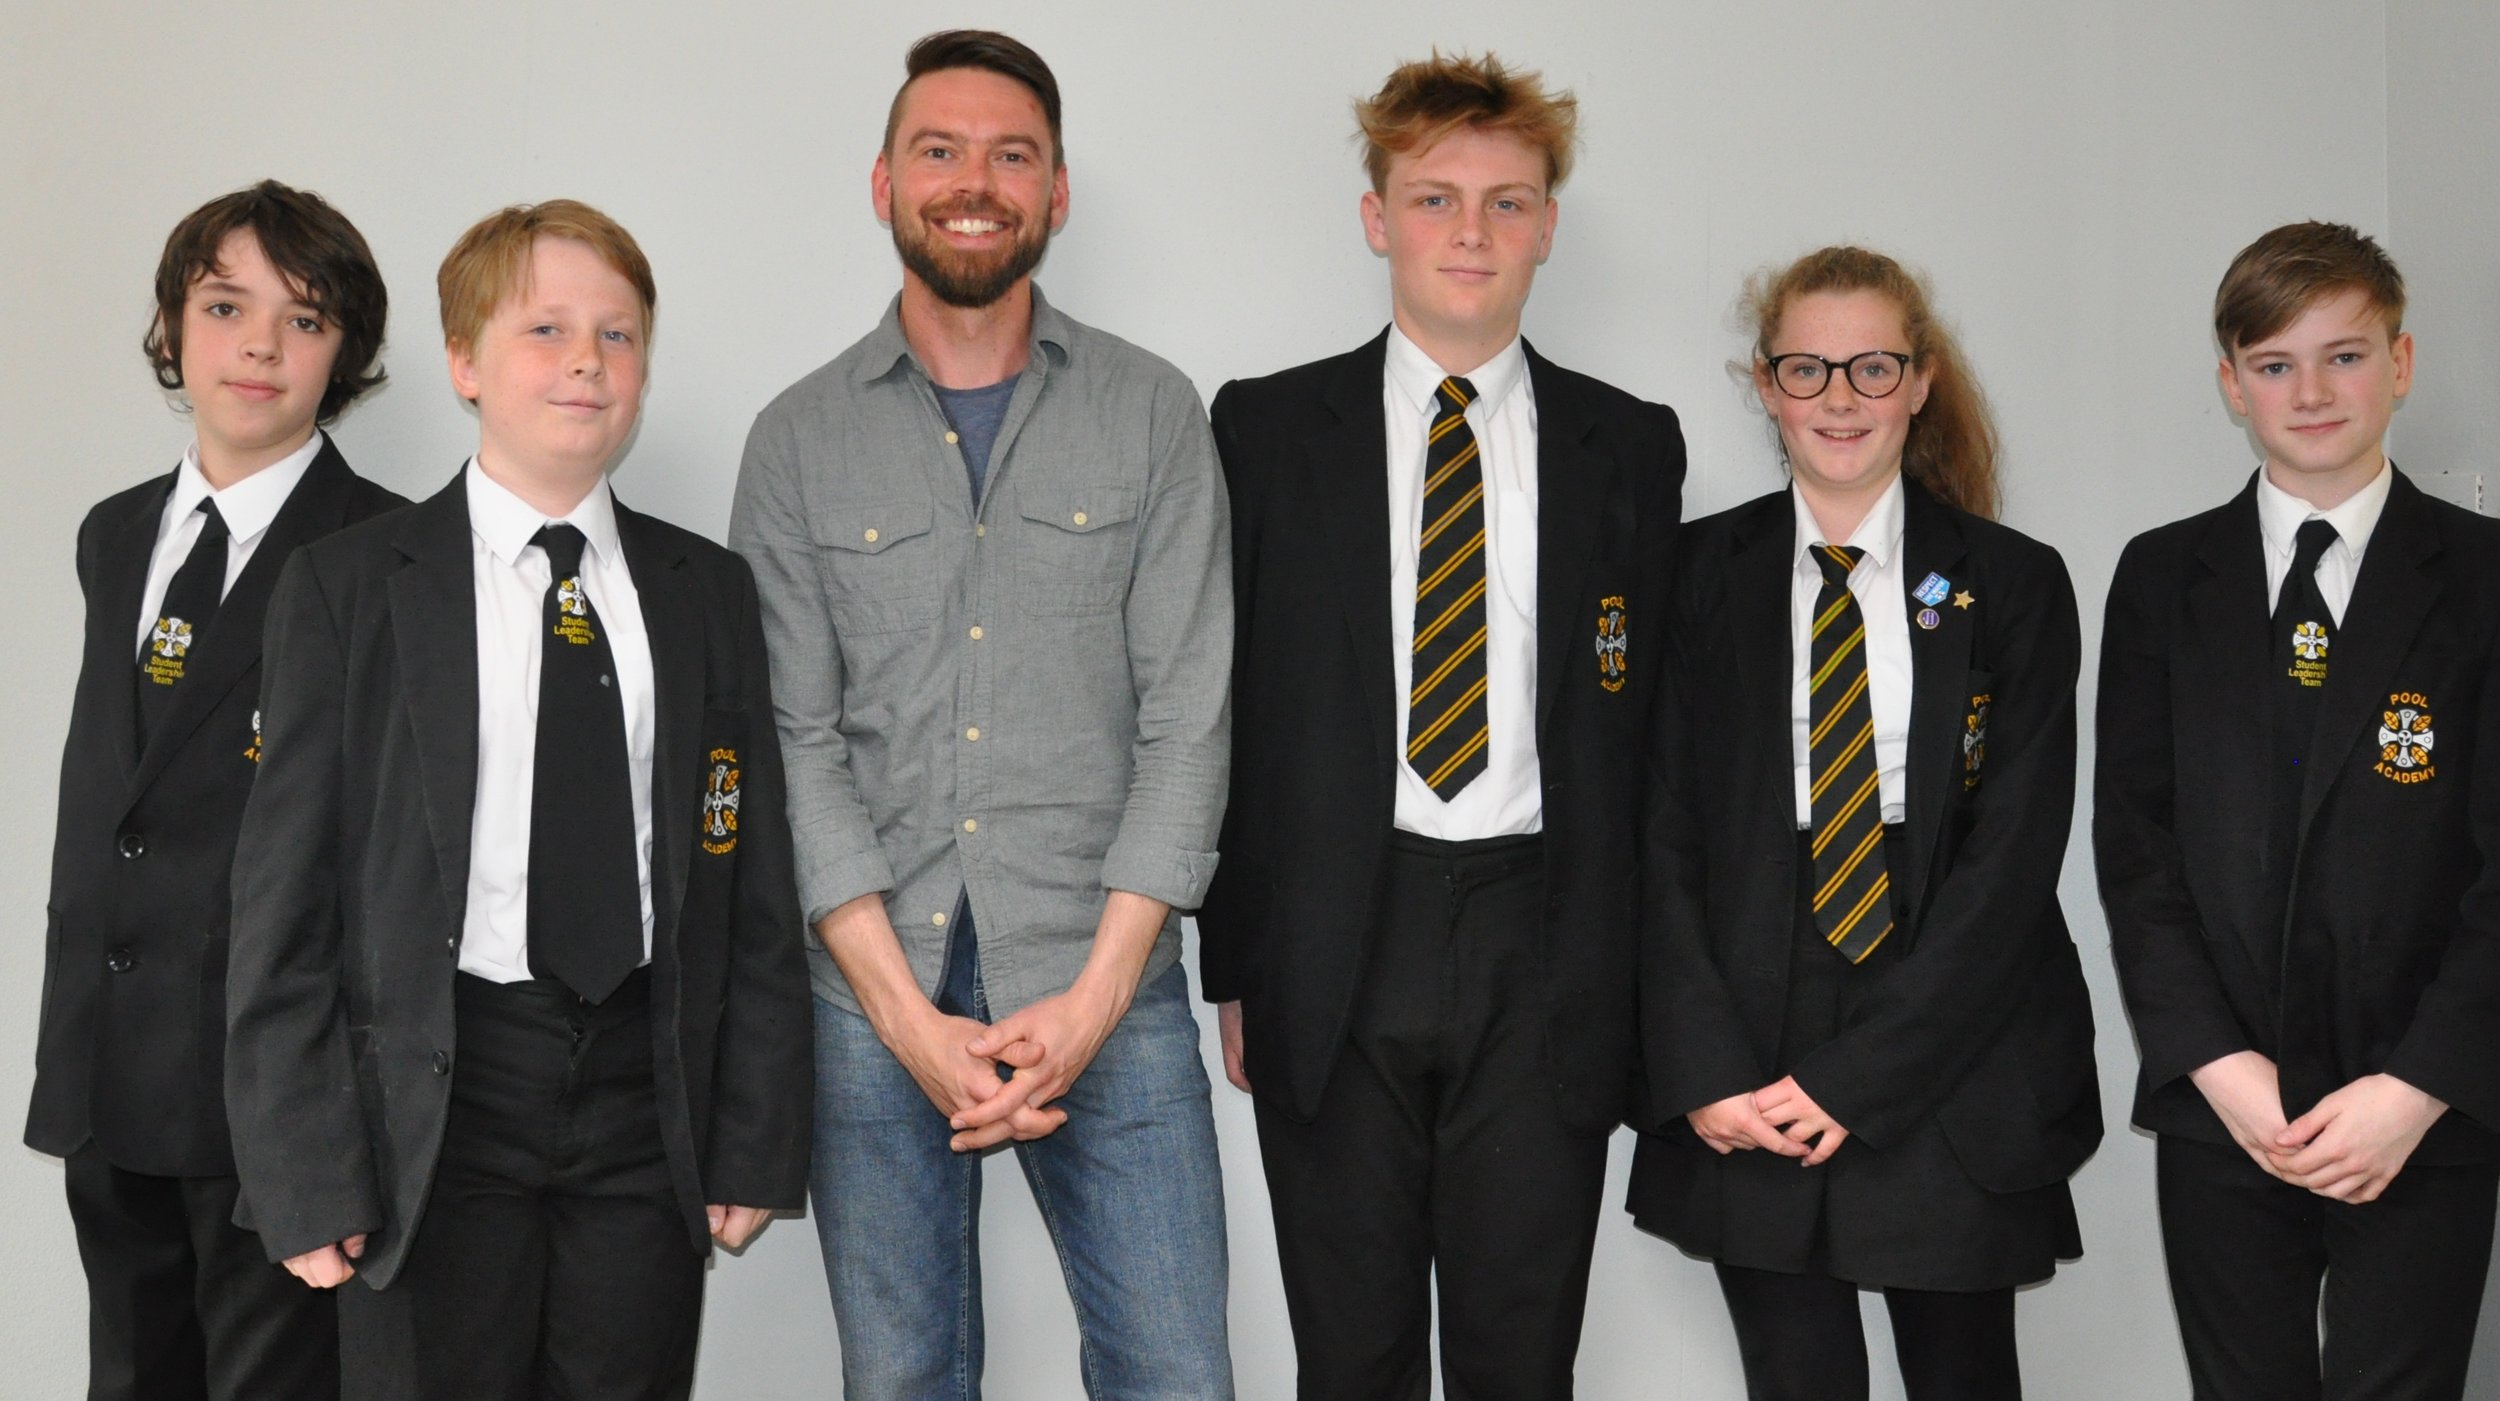 Students who met Kaj Skjervik from #loveportreath